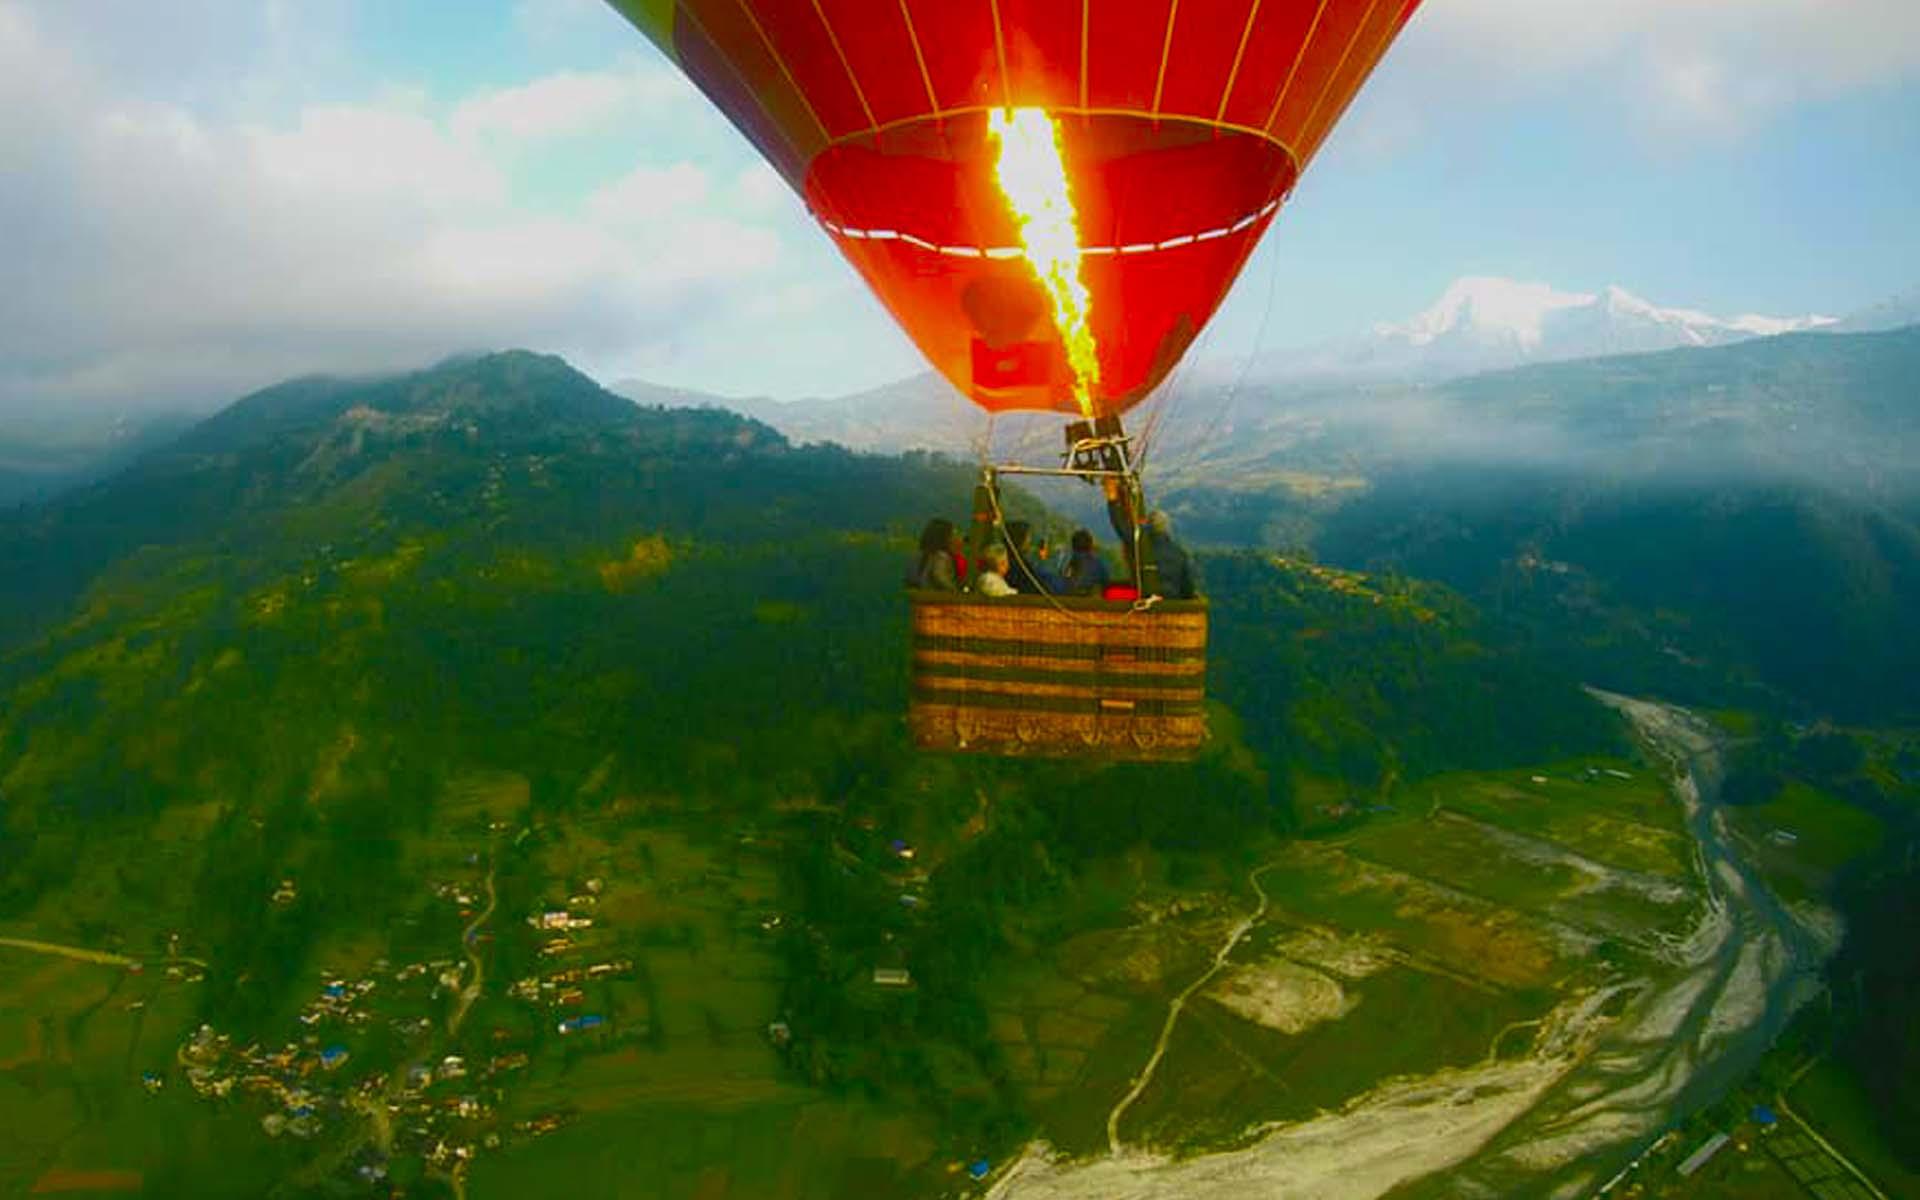 Balloon Ride